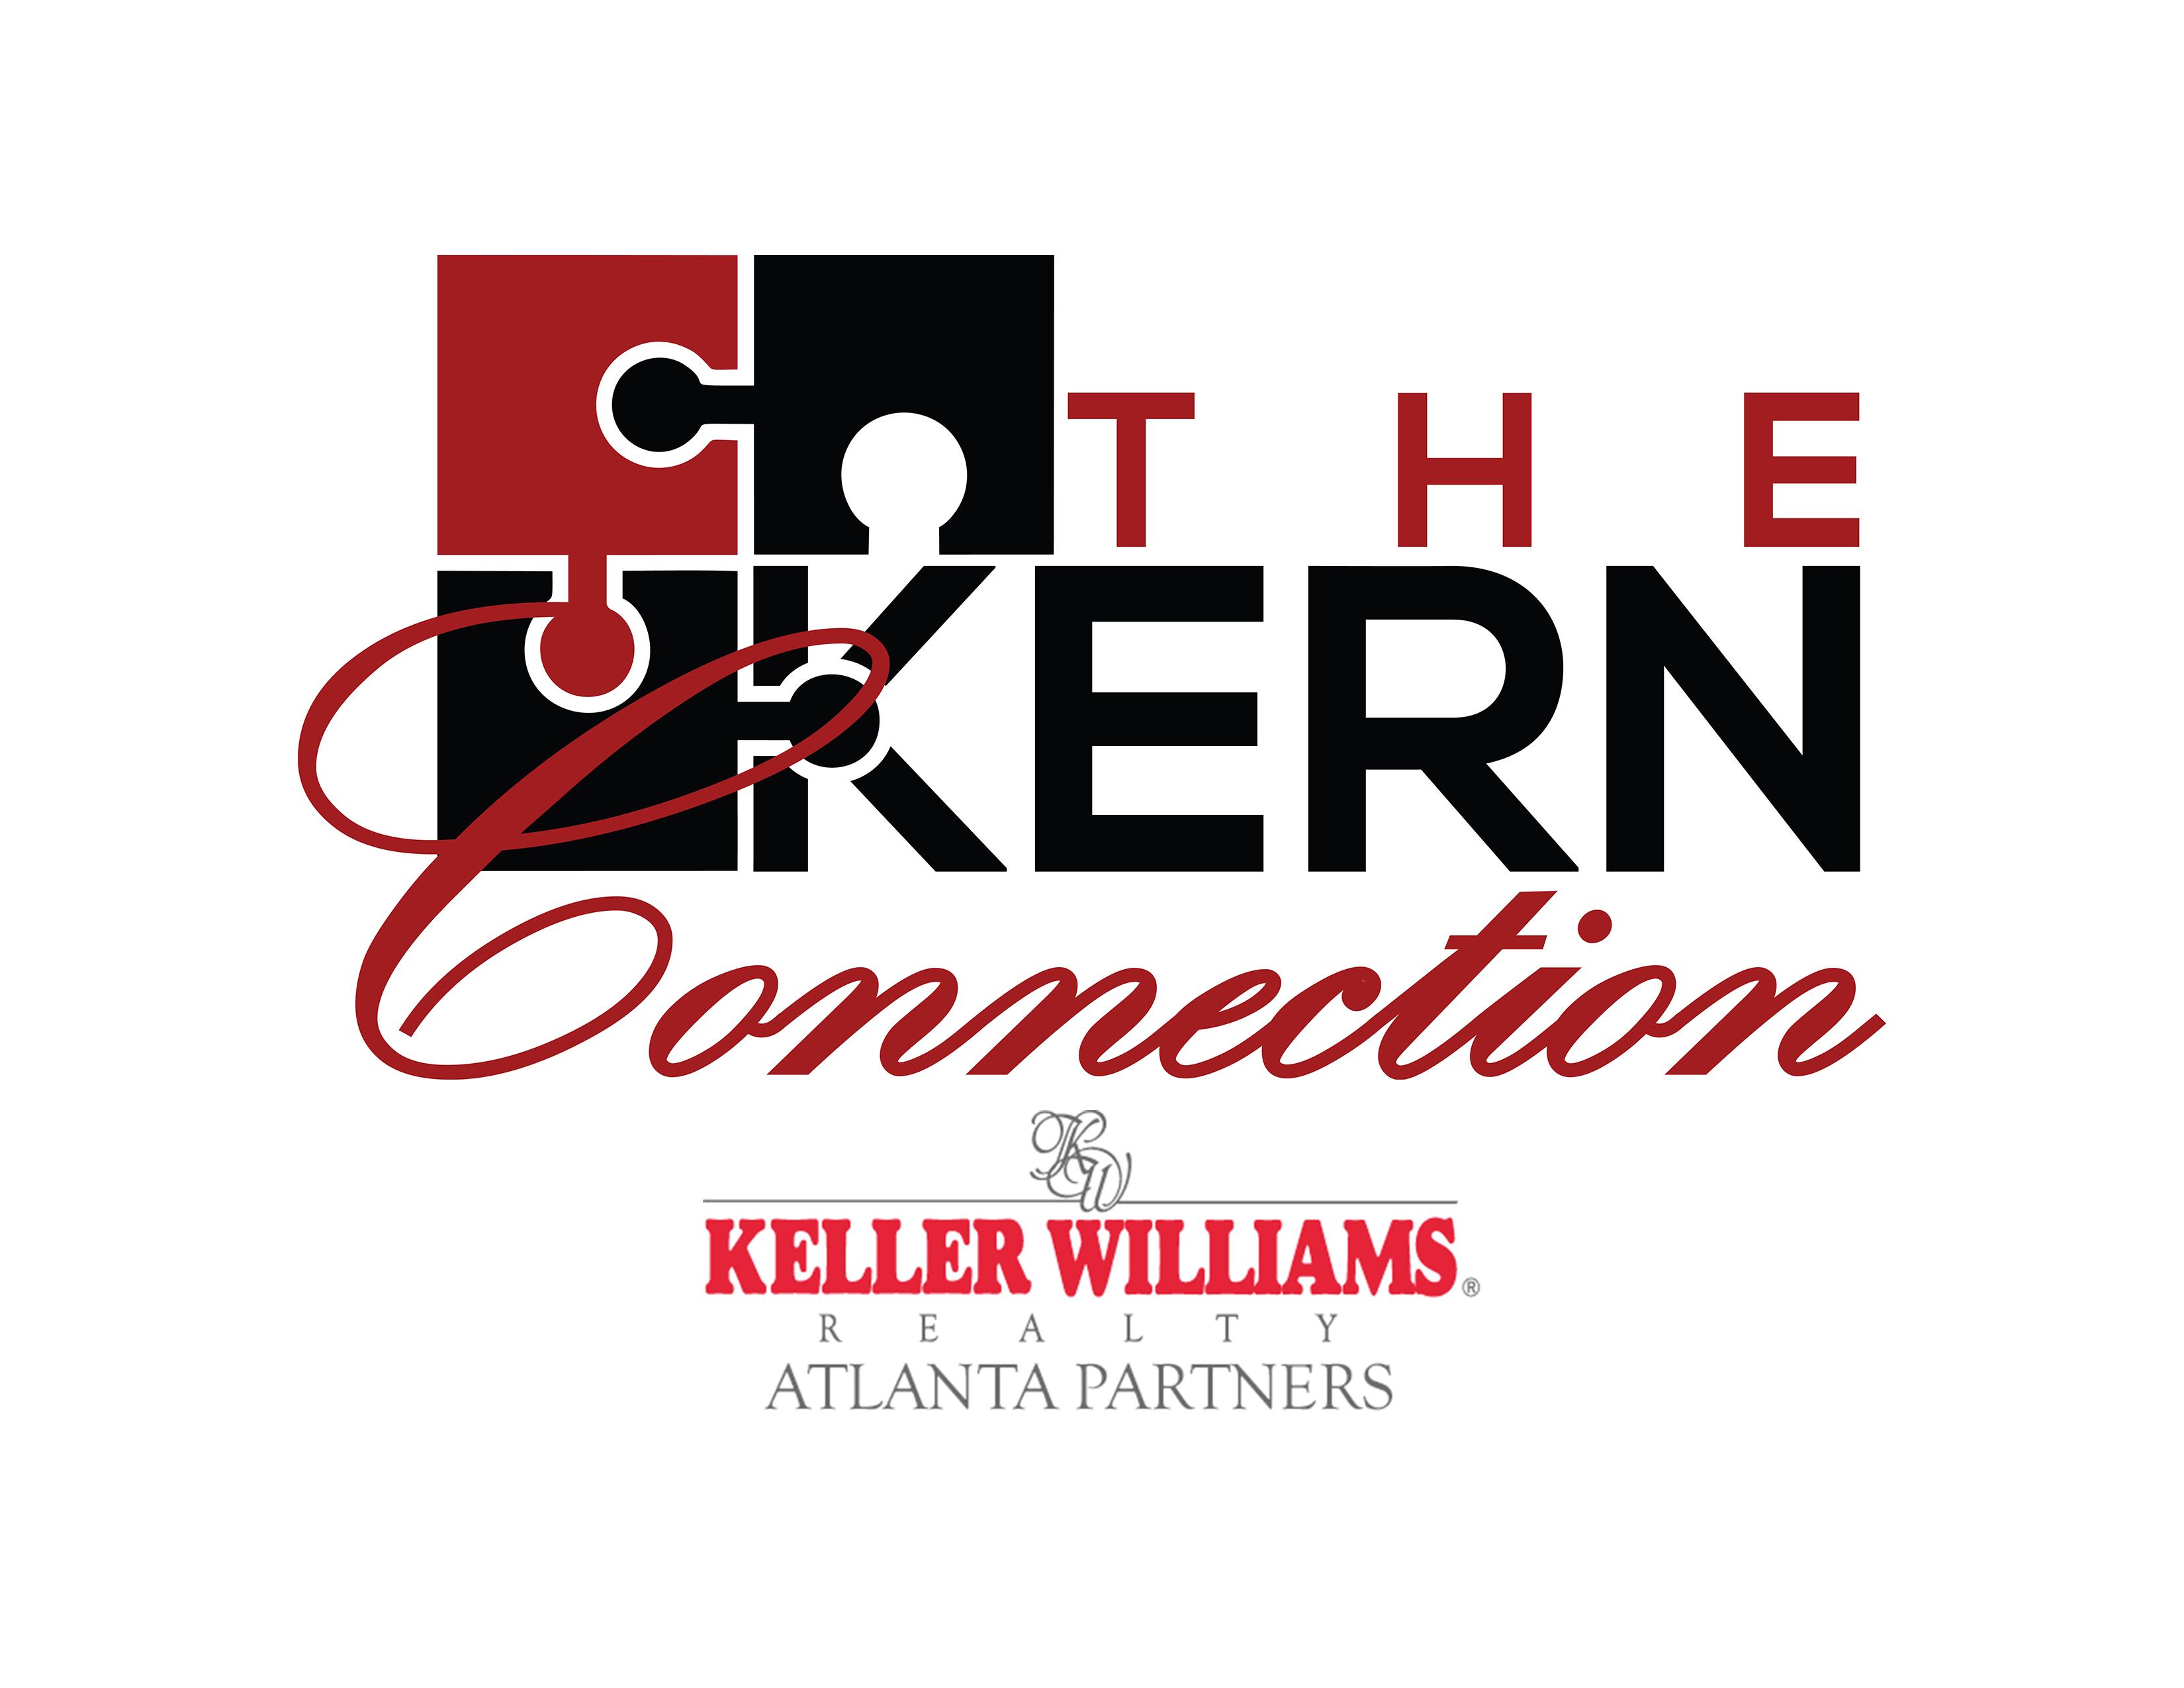 Kern Connection/Keller Williams Realty, Atlanta Partners, Sugarloaf Logo